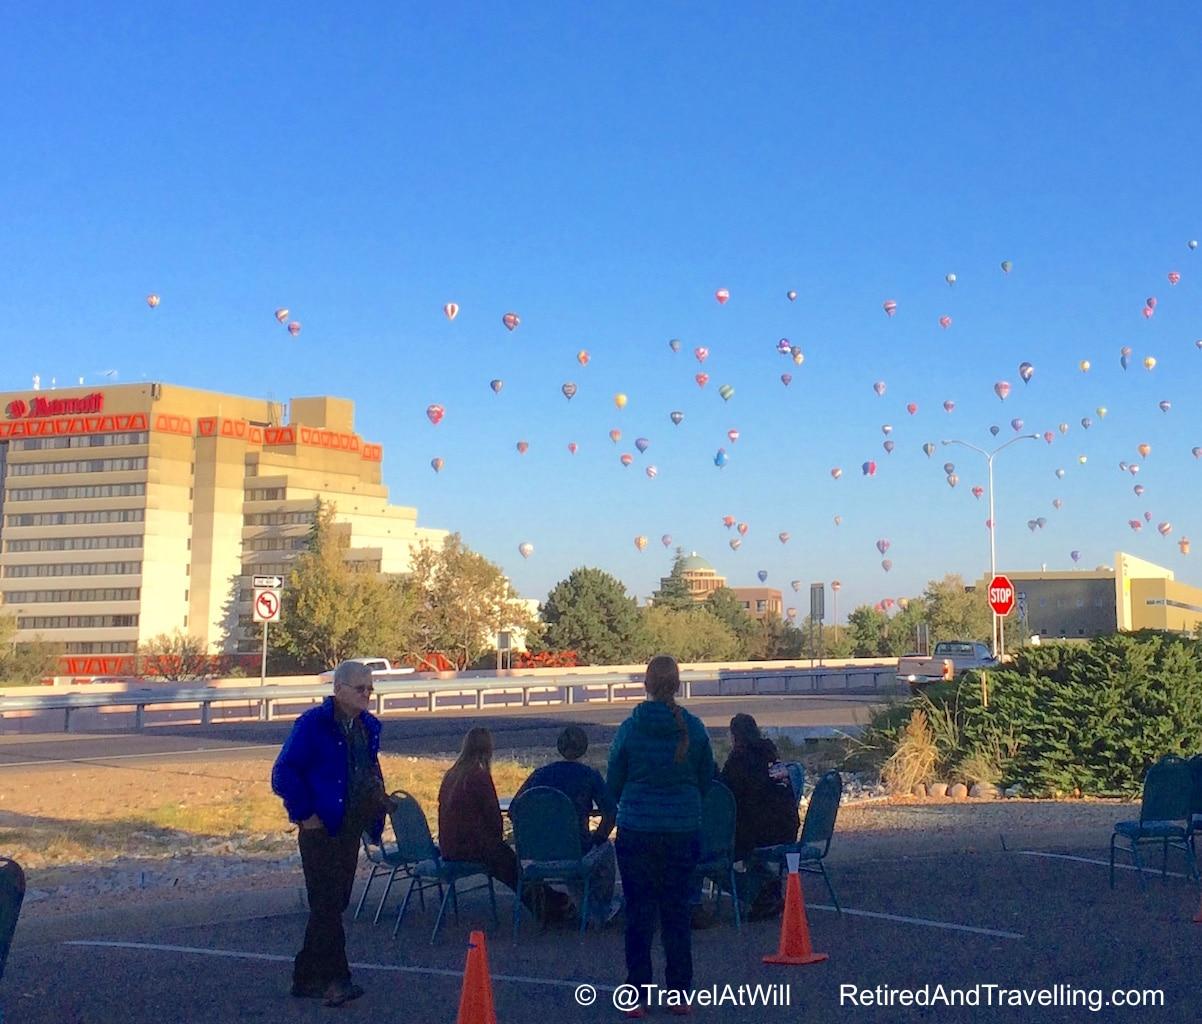 Balloon Fiesta Mass Ascension.jpg